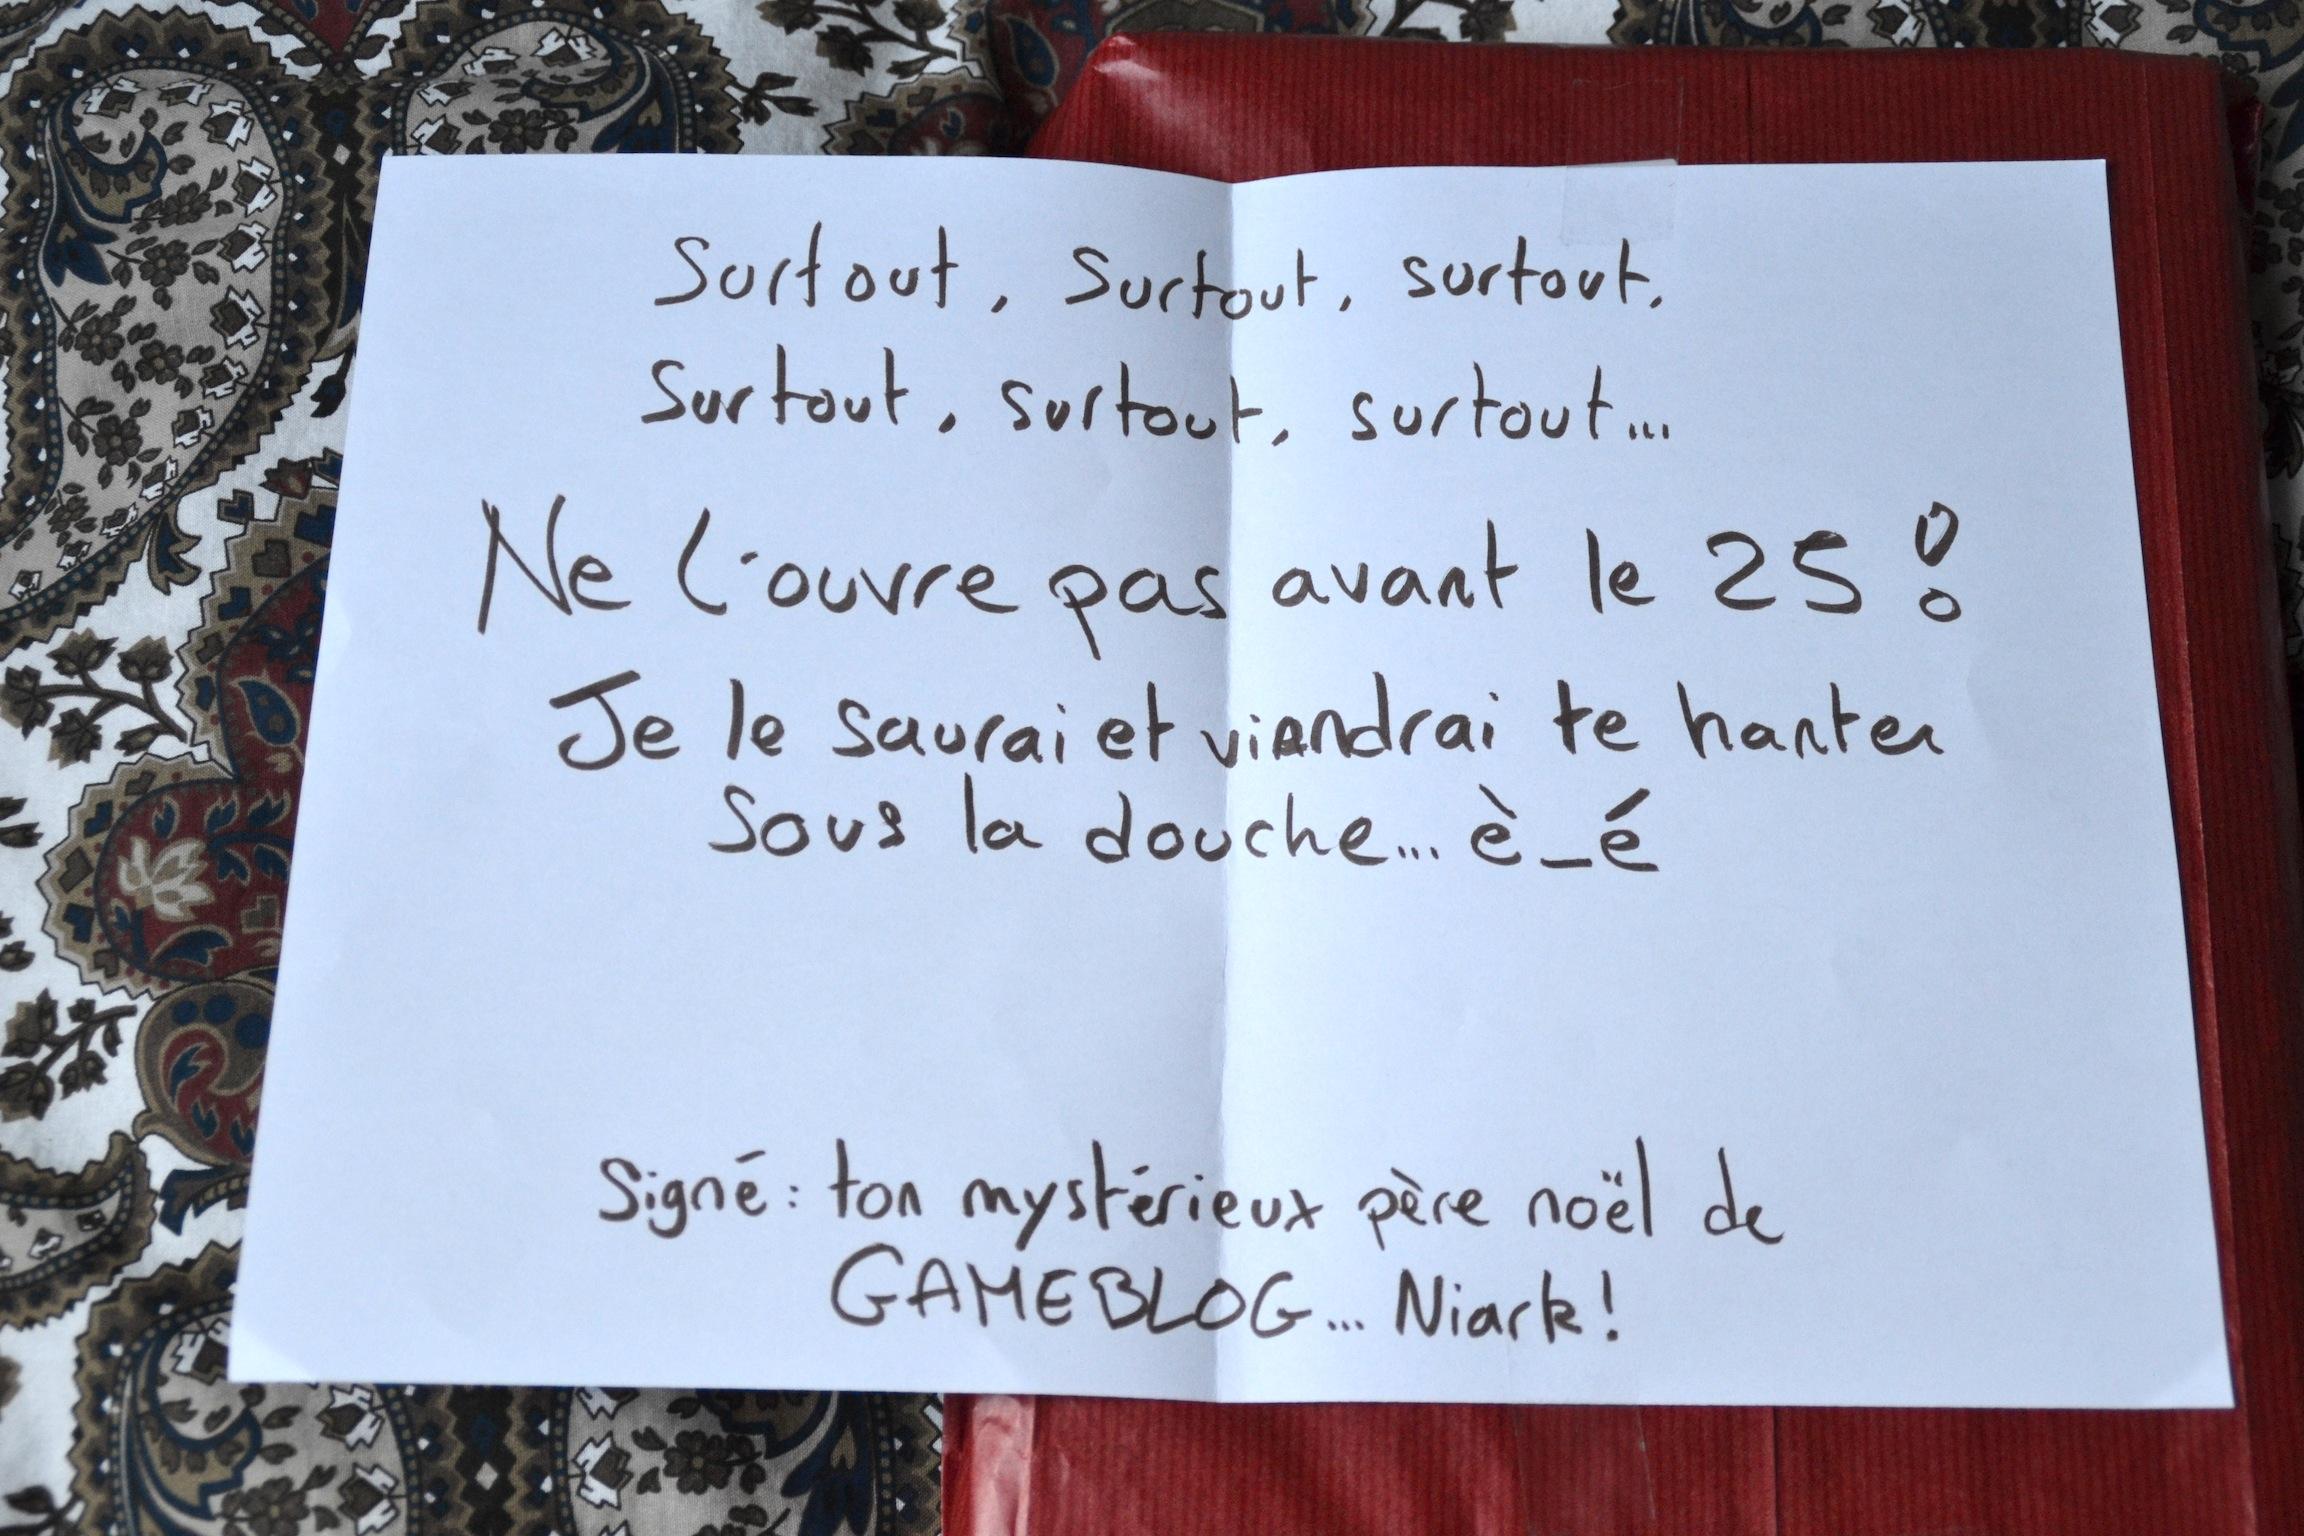 Idee cadeau pour sa copine a noel   Airship paris.fr